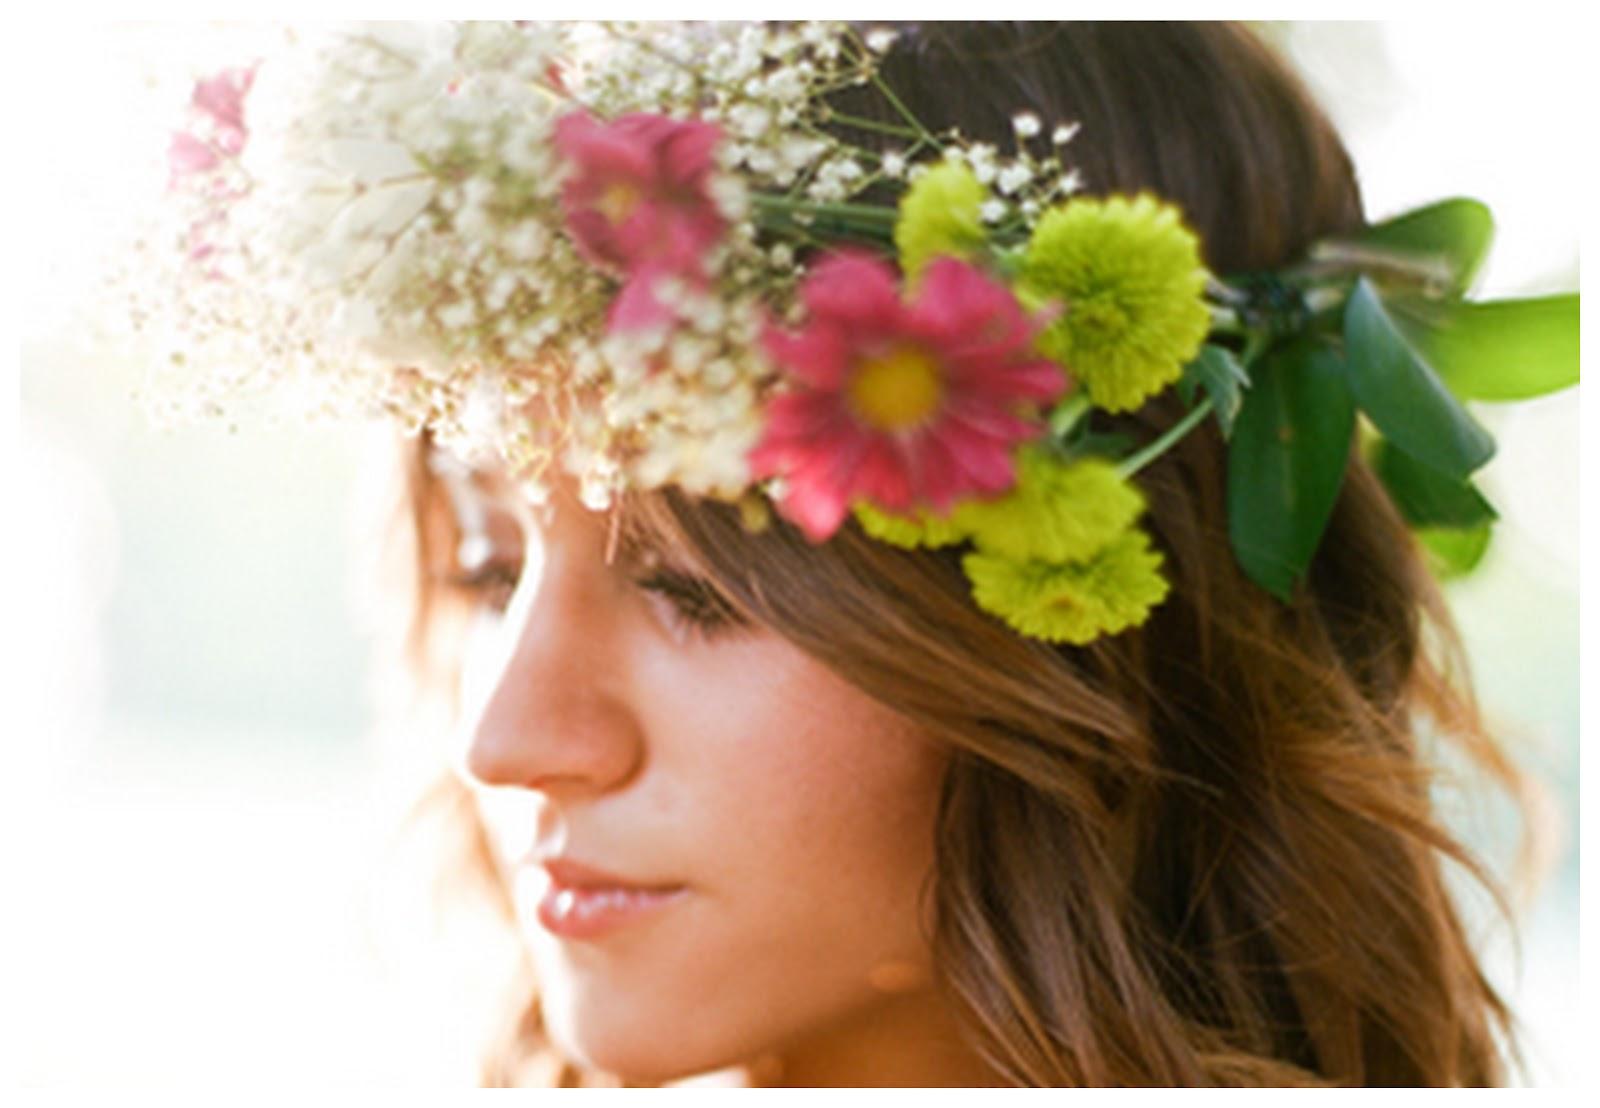 Flower crown flower crowns crowns flower austin austin gros wedding credit flower austin crowns photo photography izmirmasajfo